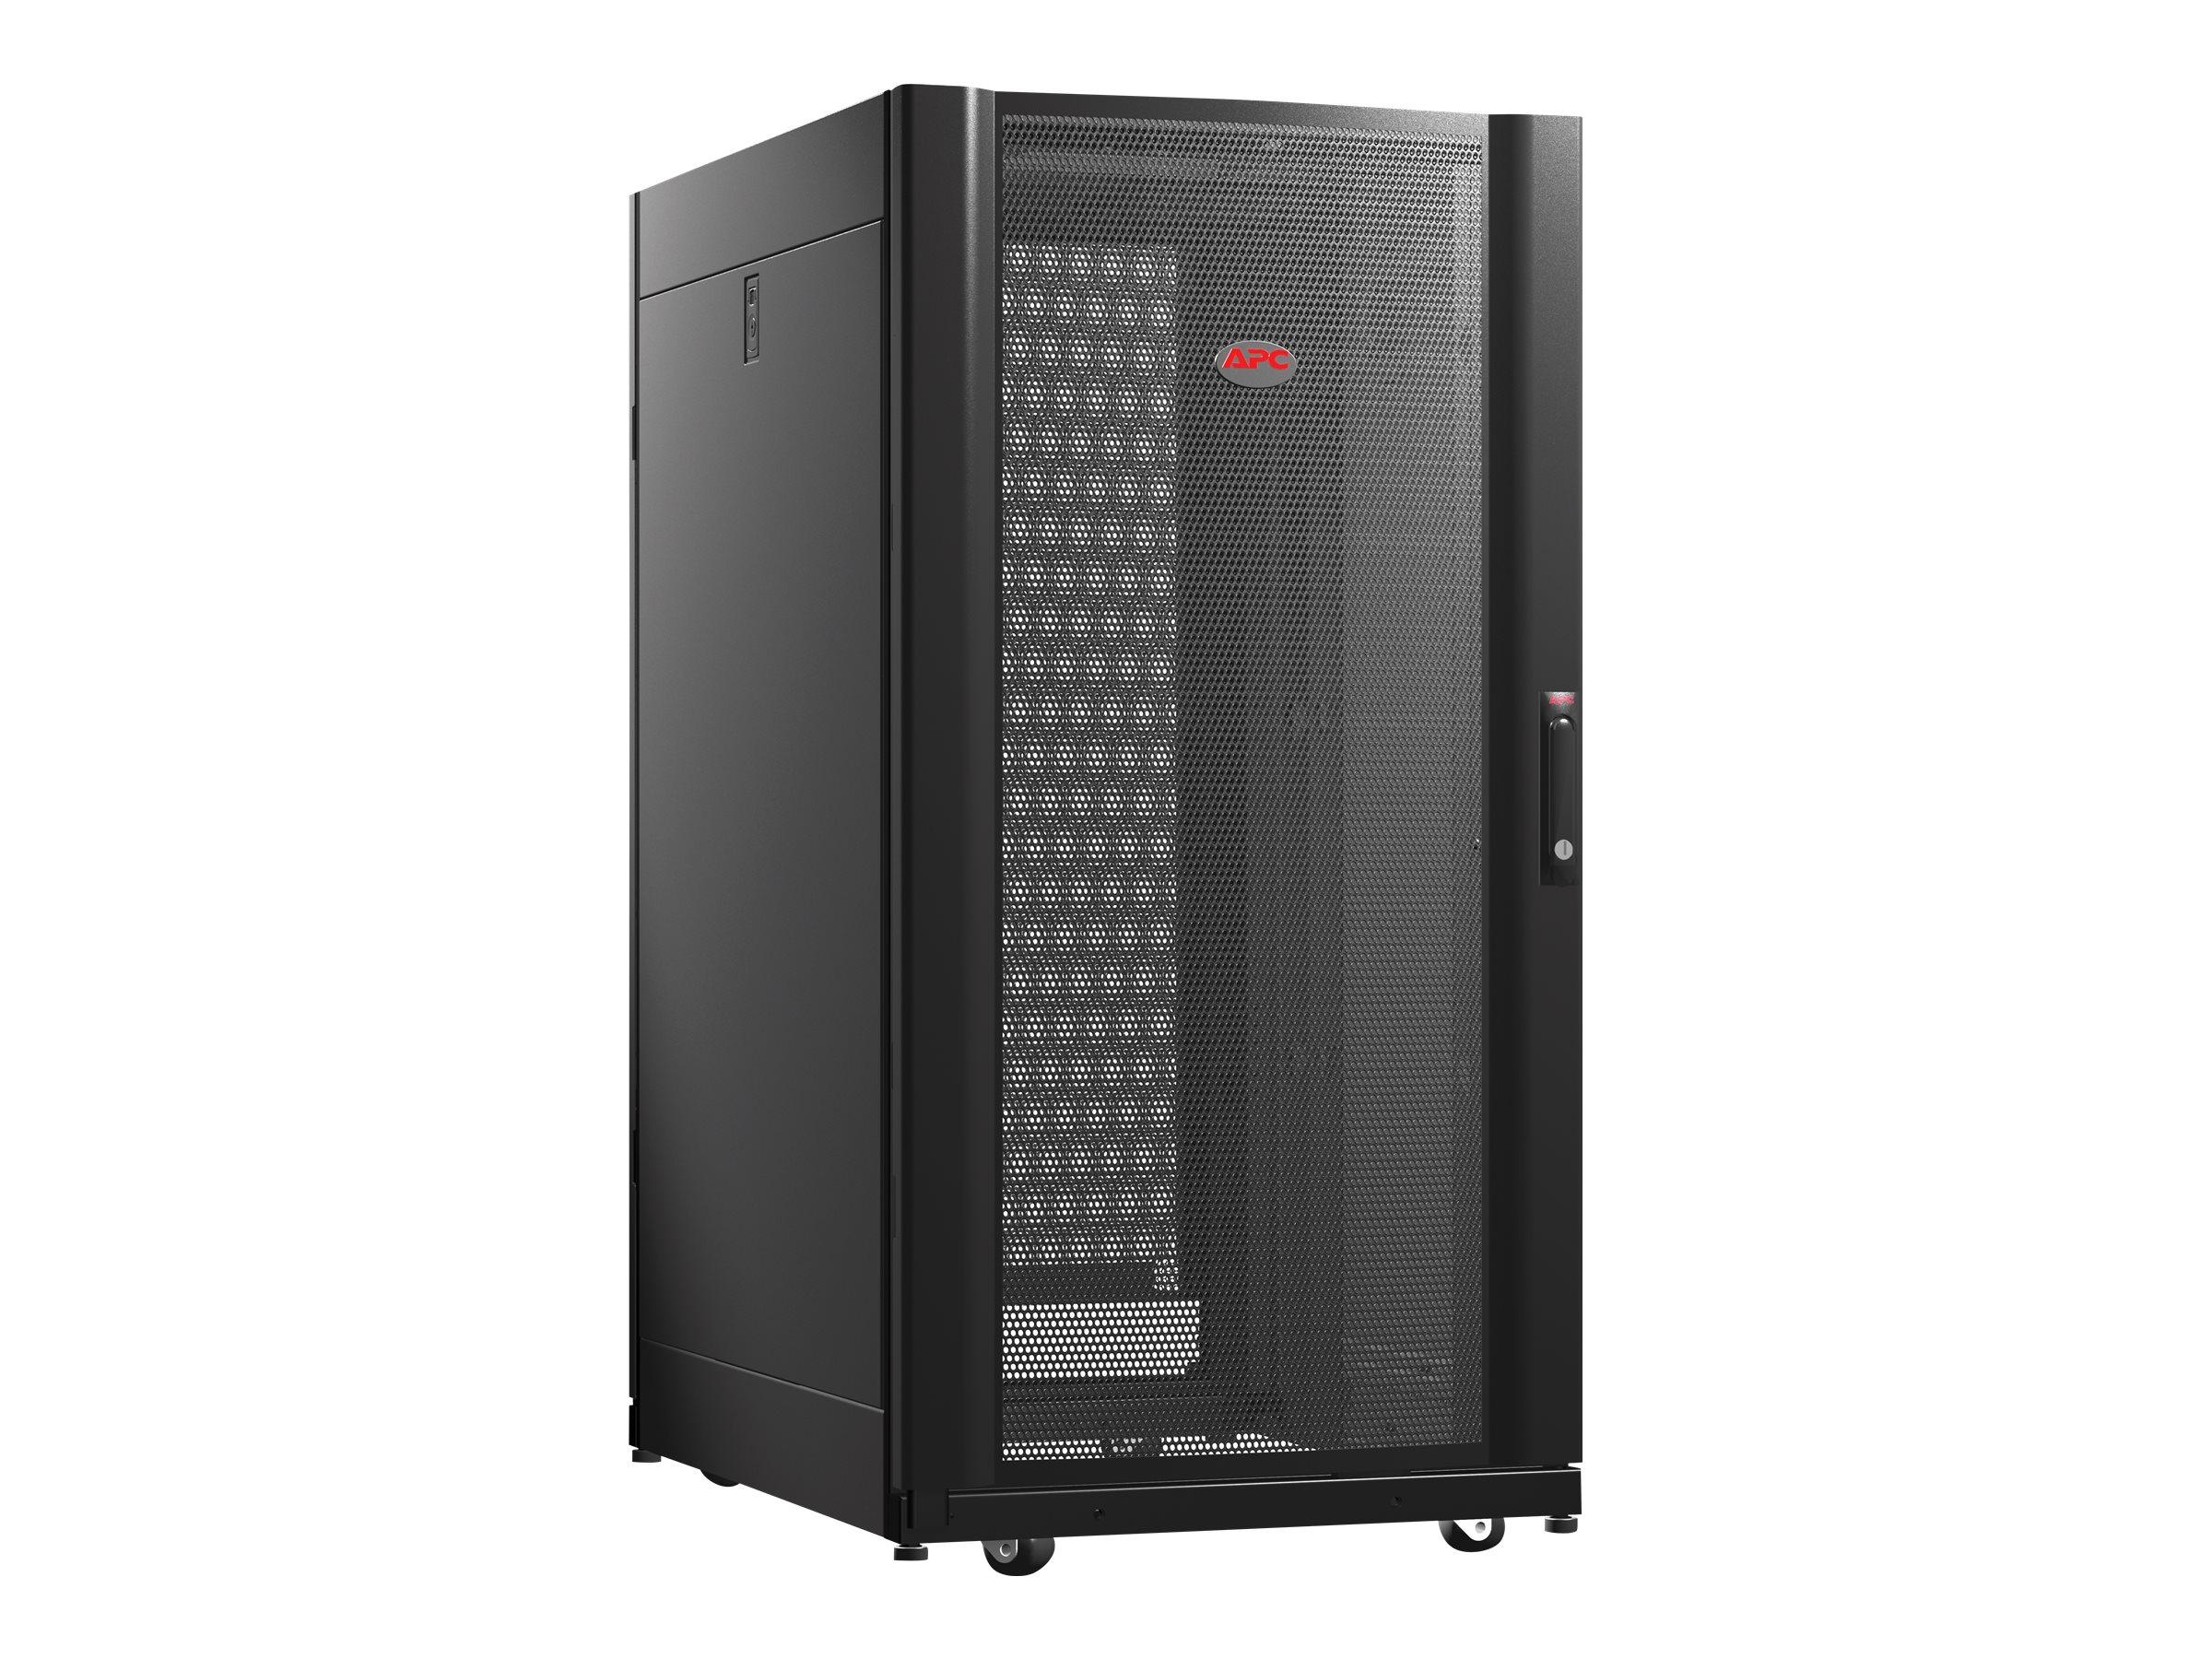 APC NetShelter AV Enclosure with Sides and 10-32 Threaded Rails rack - 24U